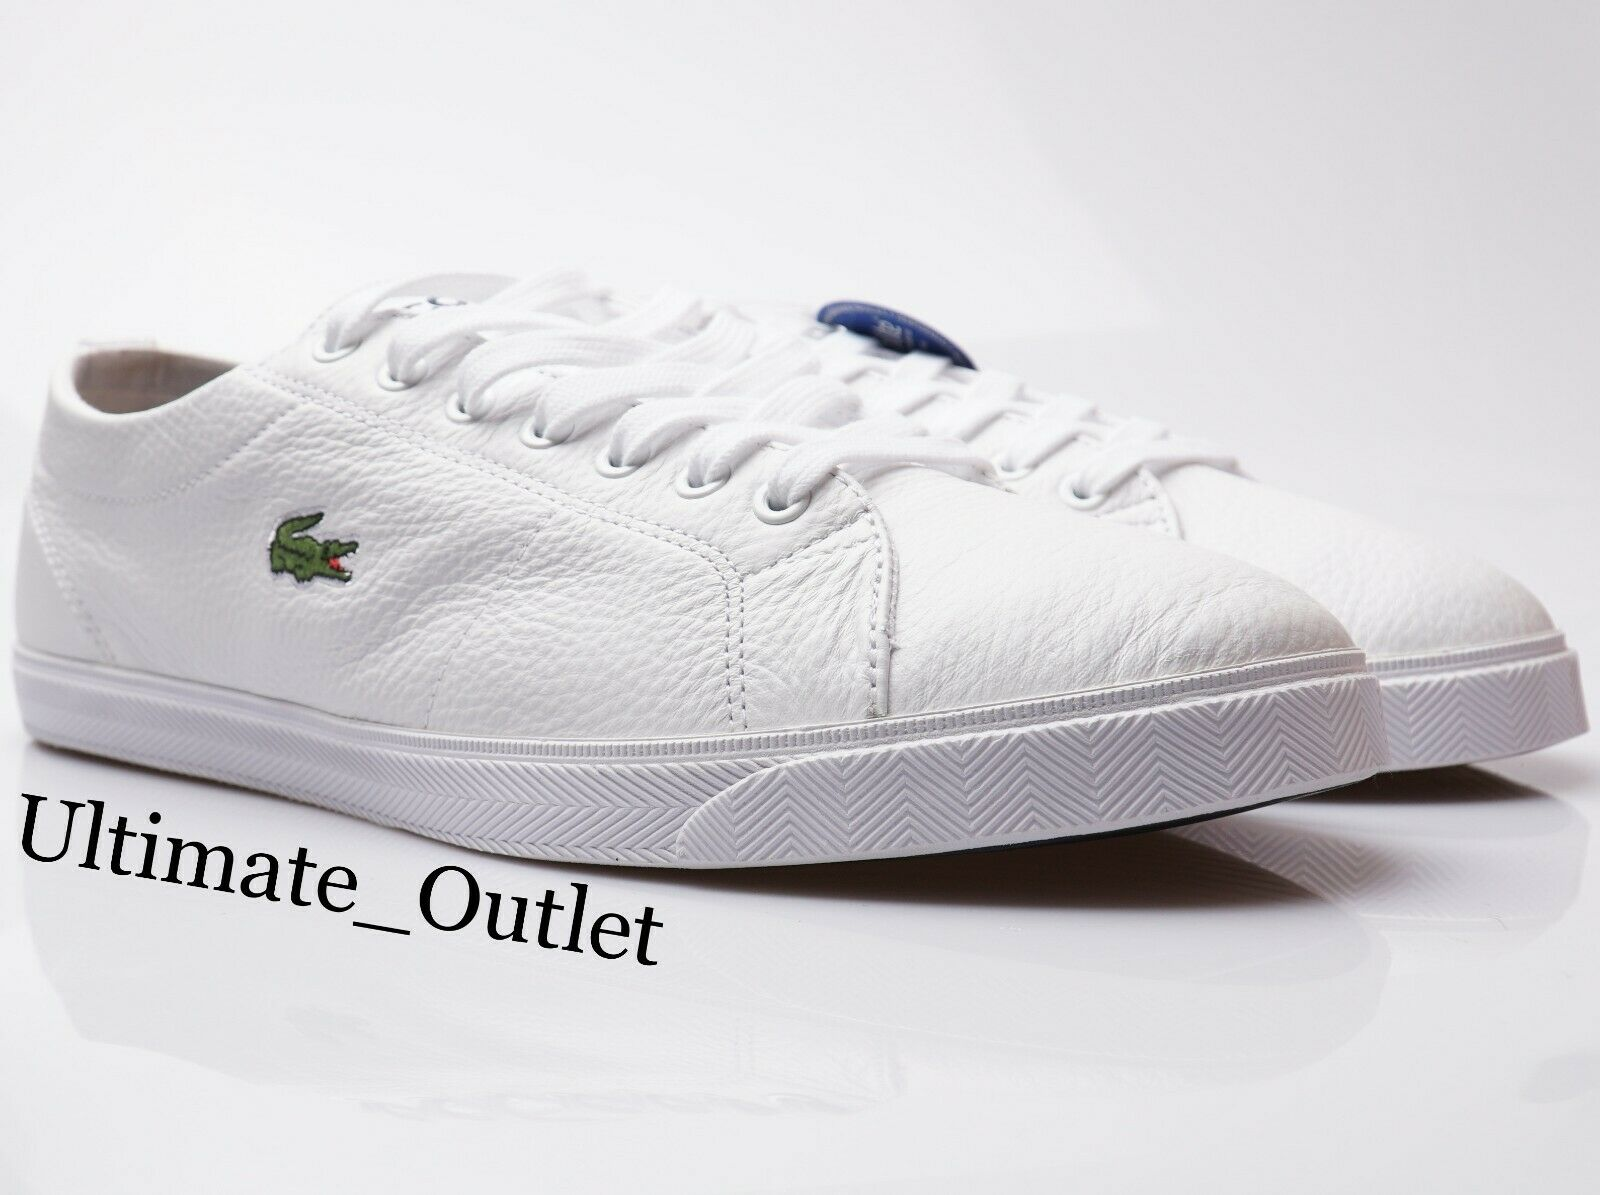 Lacoste Mens Trainers Leather Premium Premium Premium Turnschuhe Weiß schuhe 24H Delivery 64808e